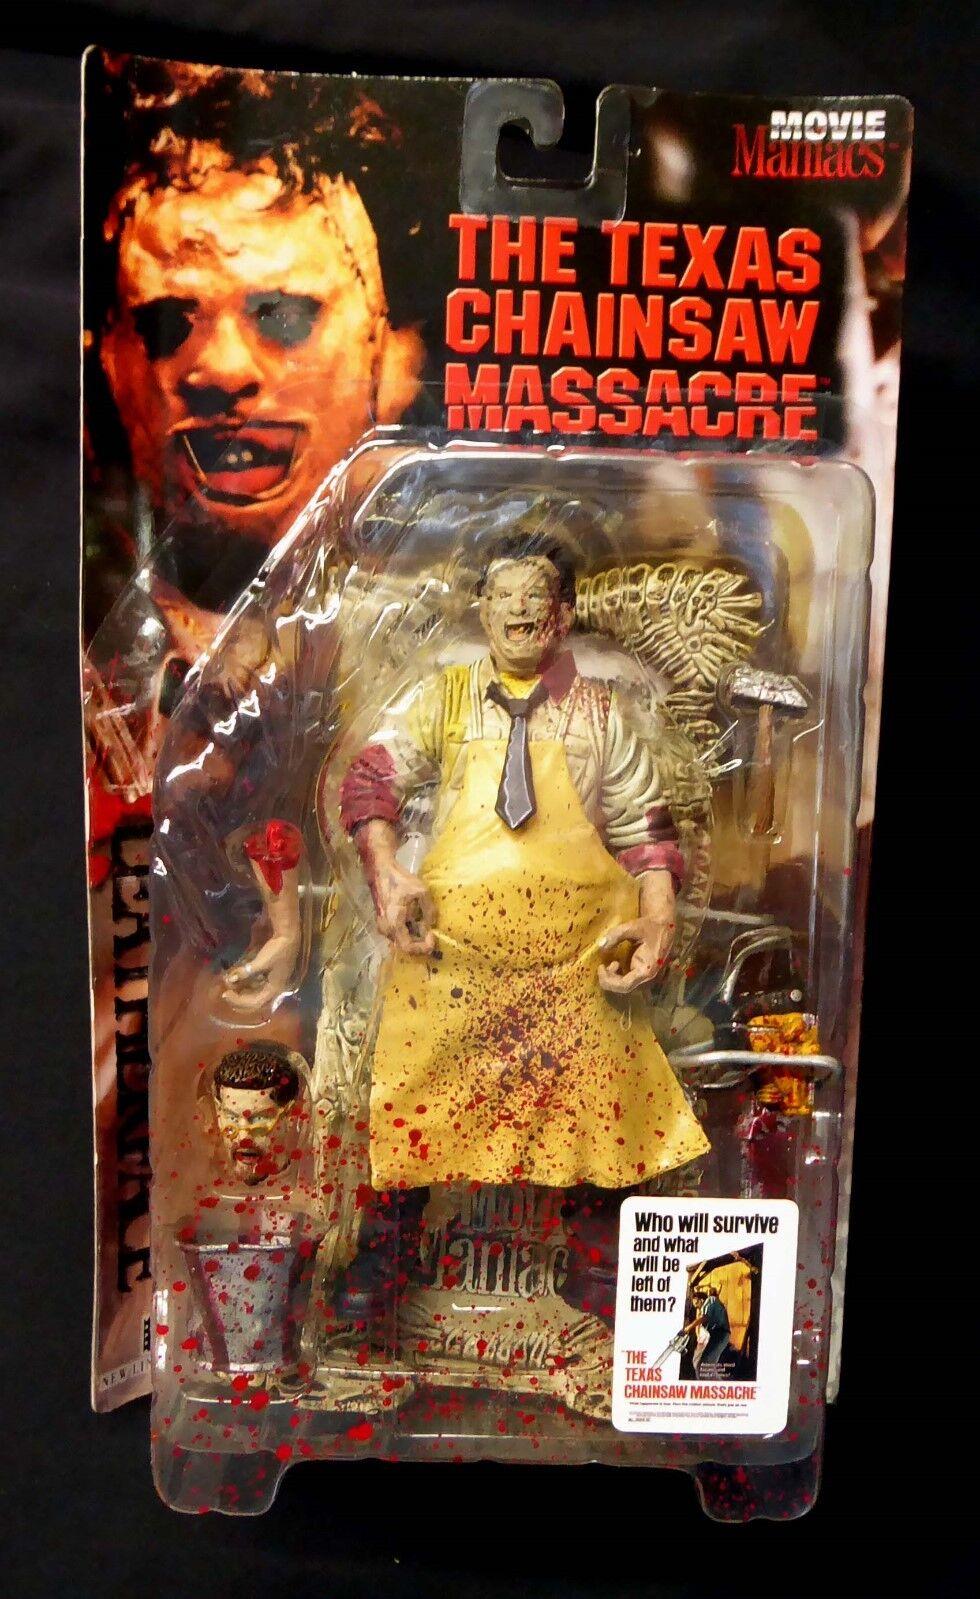 McFarlane giocattoli Movie uomoiacs Super Bloody Leatherface Variant cifra nuovo  1998  in vendita